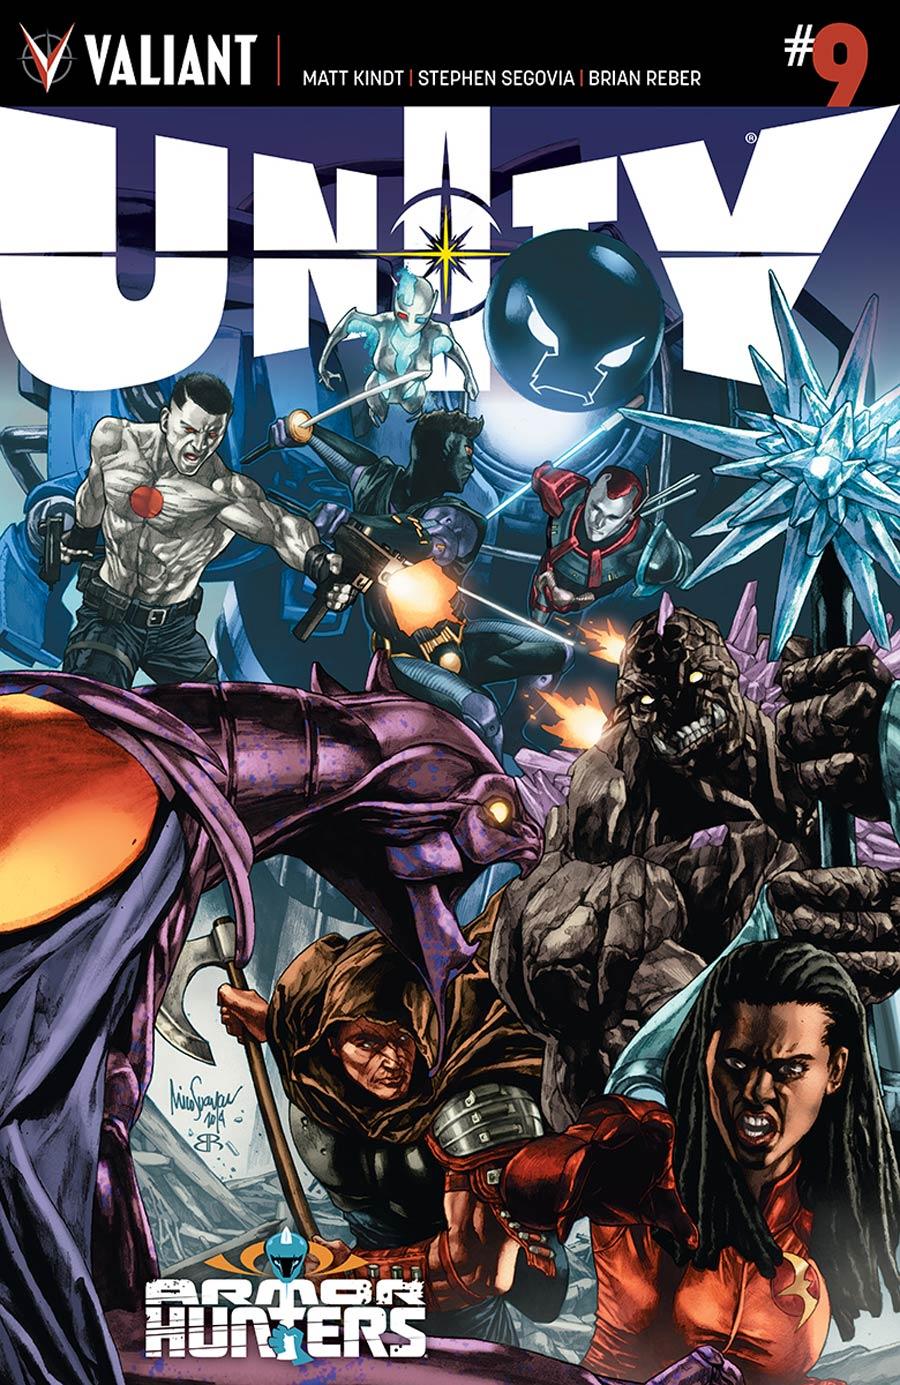 Unity Vol 2 #9 Cover A Regular Mico Suayan Cover (Armor Hunters Tie-In)